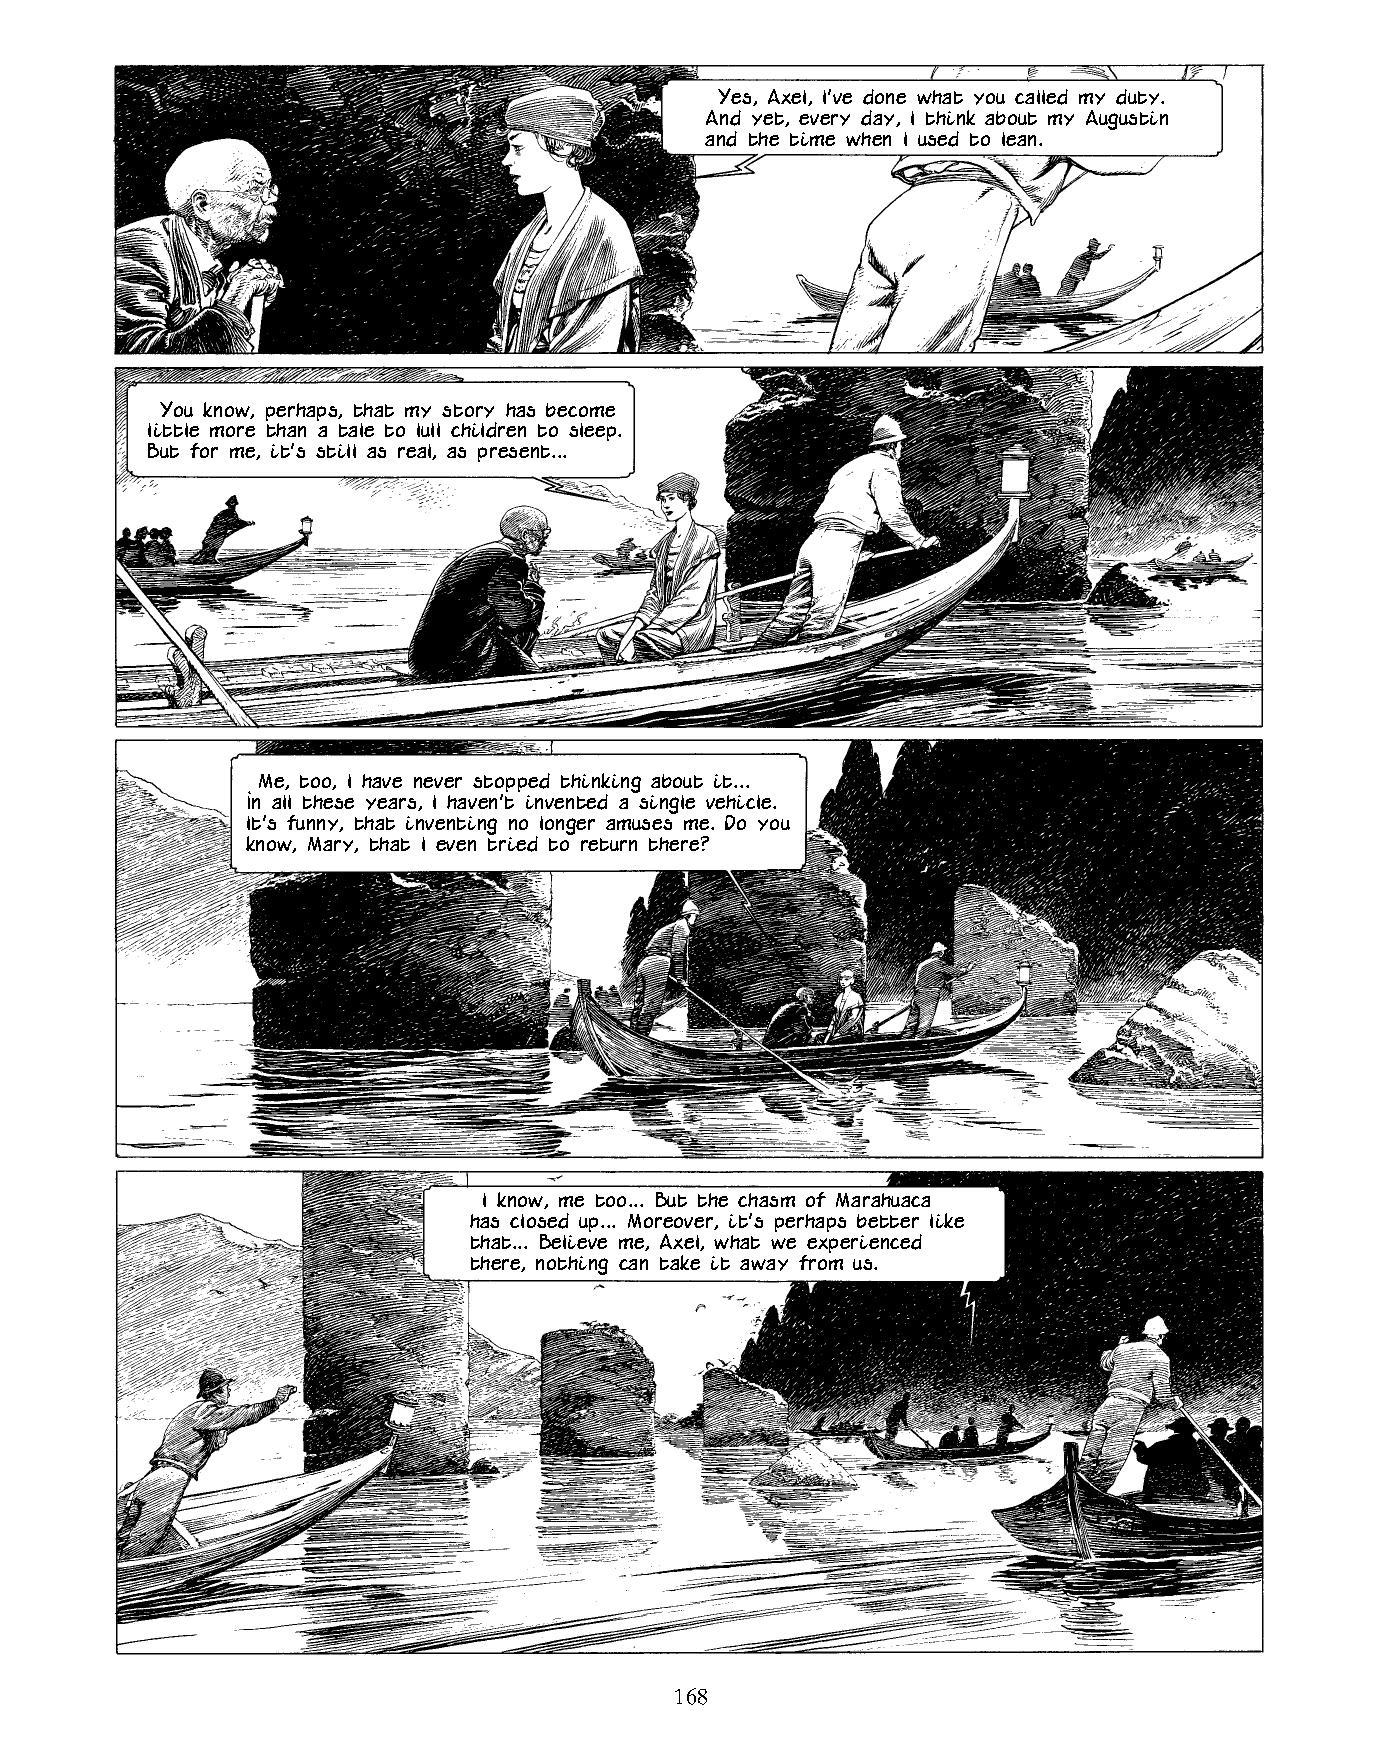 The Leaning Girl - båtar